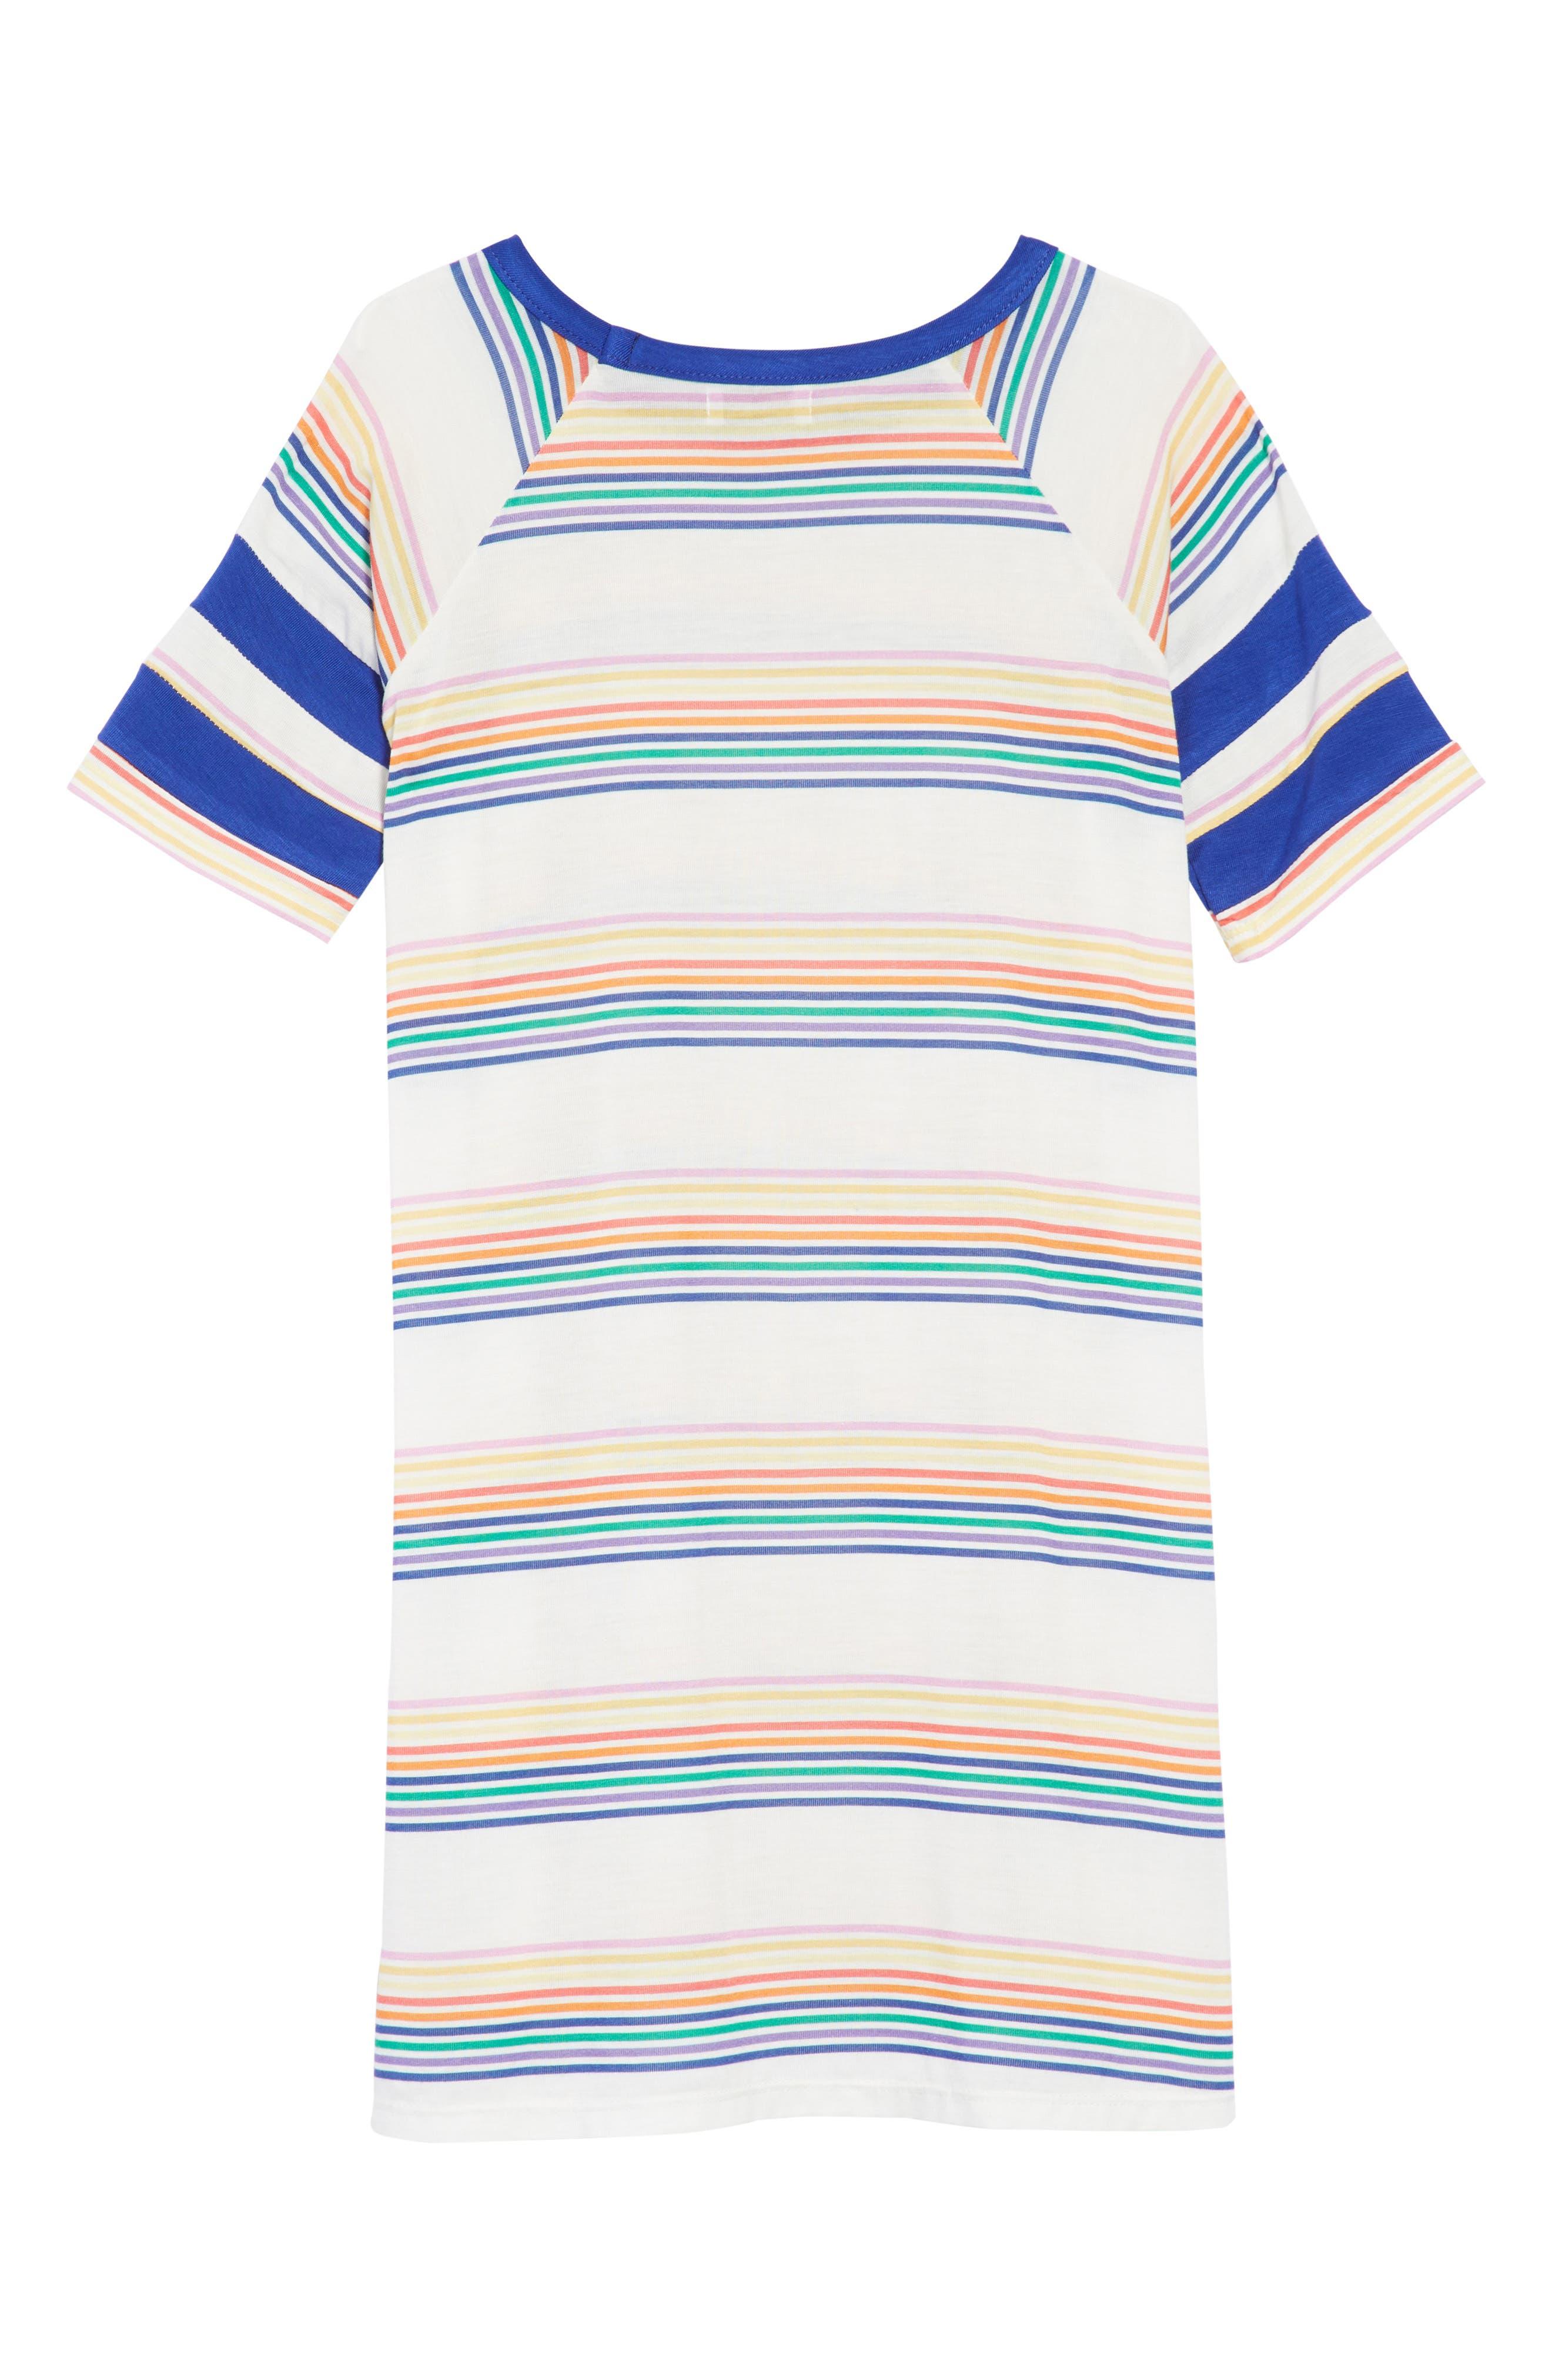 Mineral Wash T-Shirt Dress,                             Alternate thumbnail 2, color,                             Surf The Web Stripe